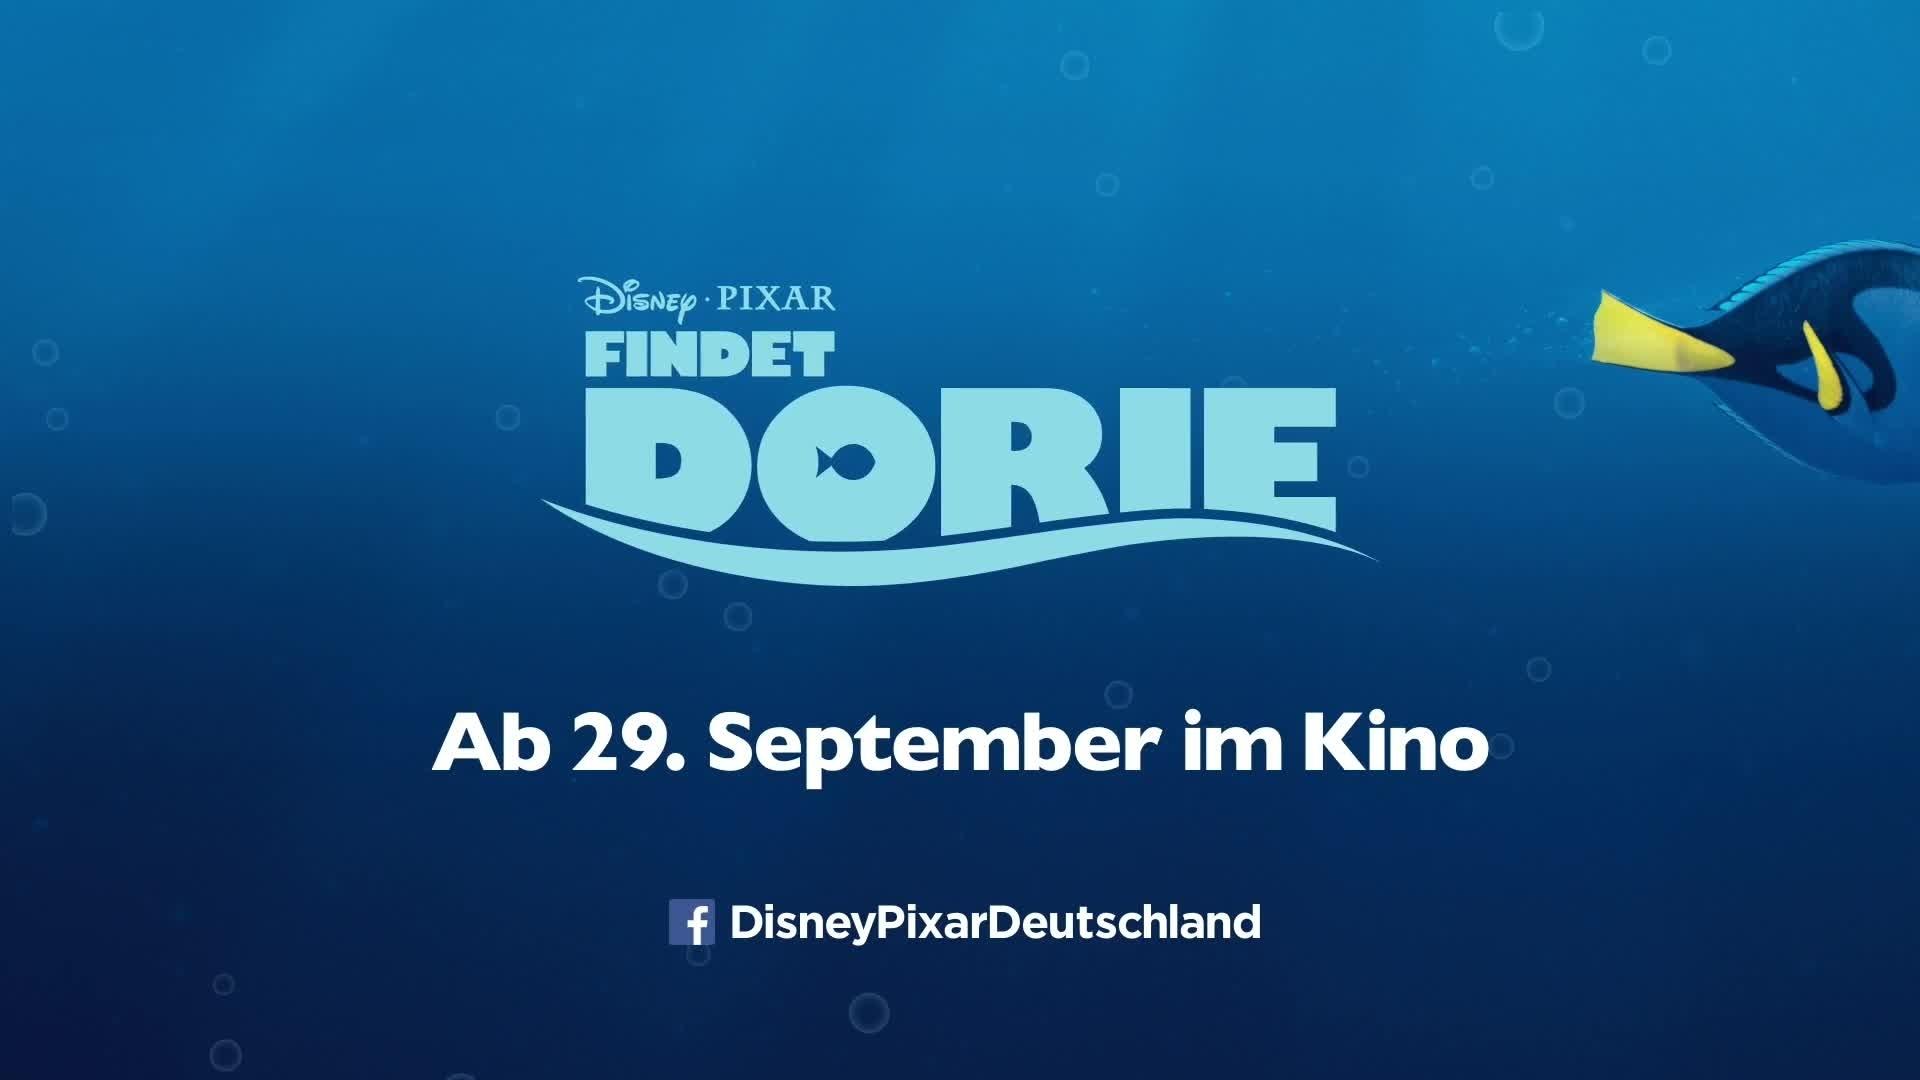 Findet Dorie: Offizieller Trailer